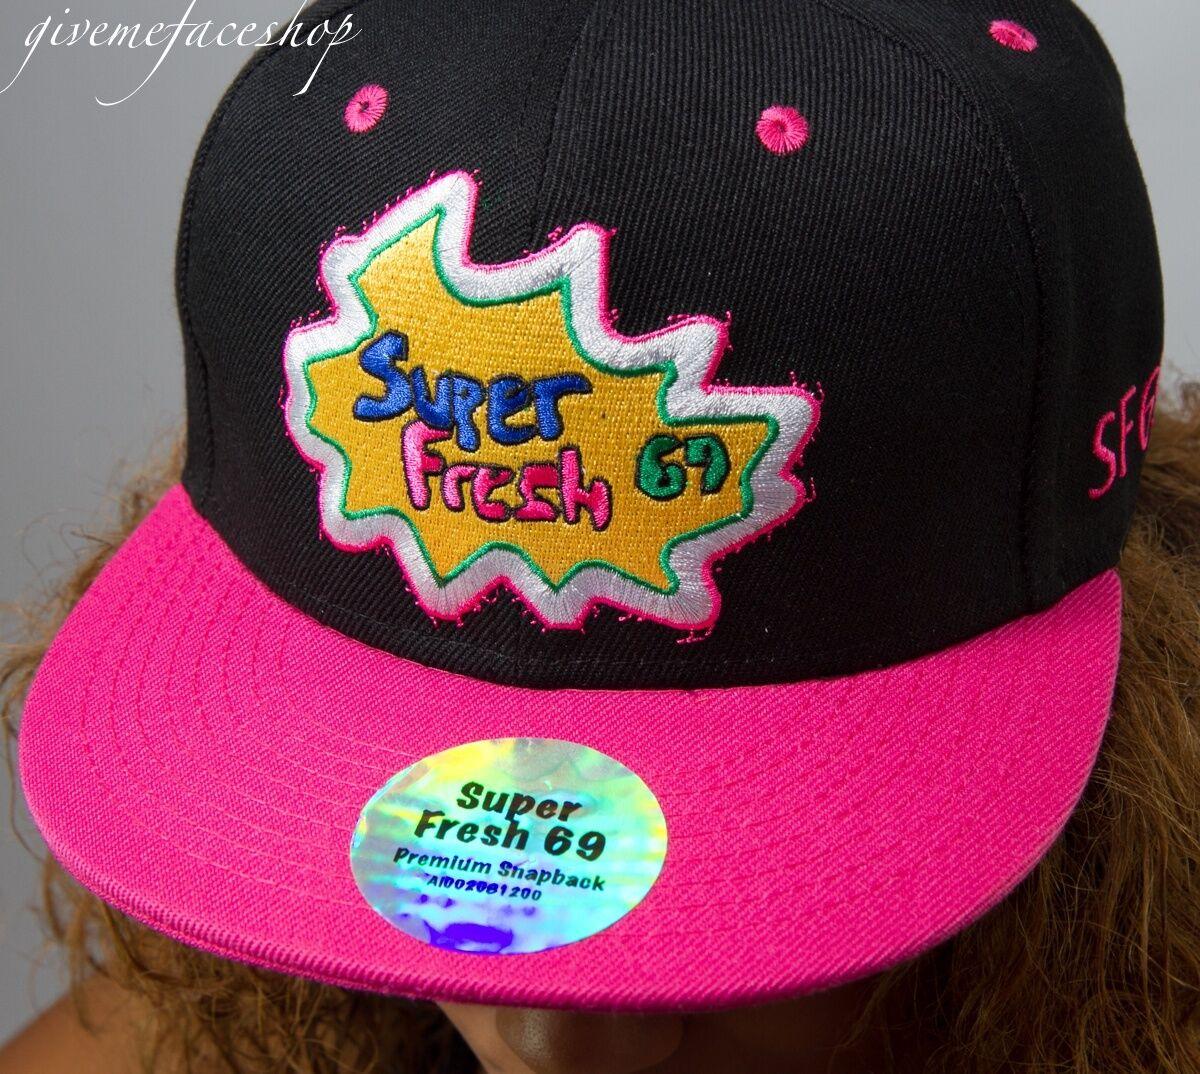 Fresh snapback Kappe, Rock Skater Flach Schirm Baseball Supreme Hiphop Retro